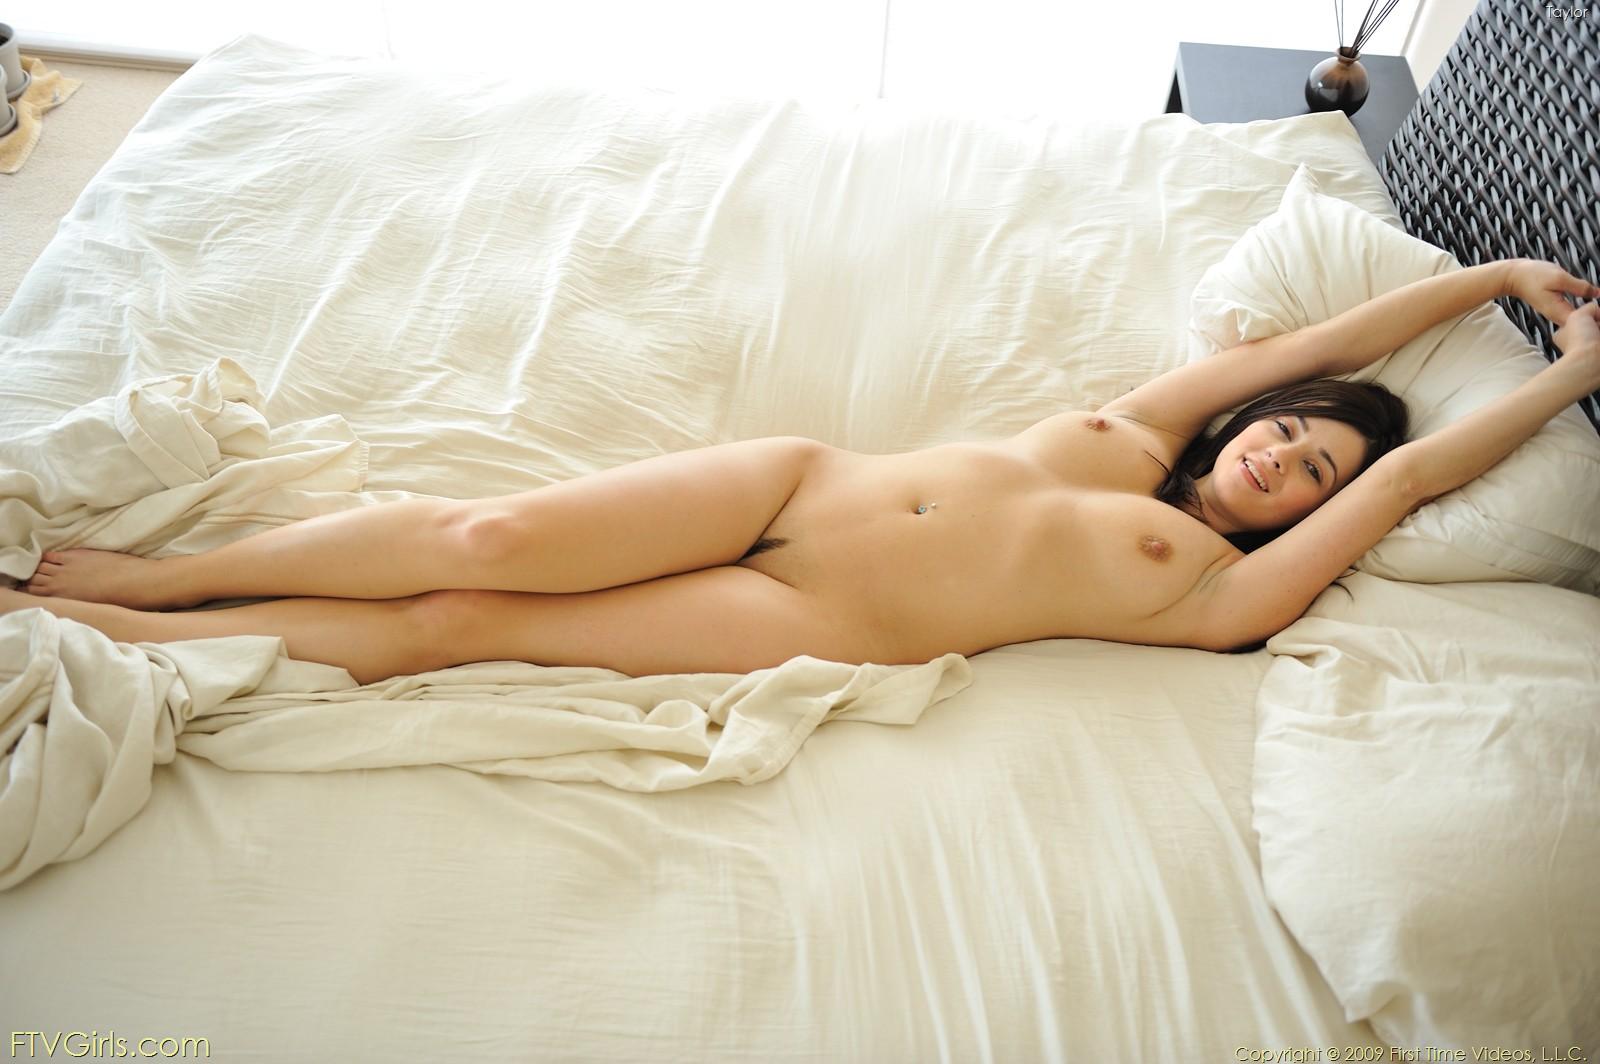 Vixen naked women — photo 11